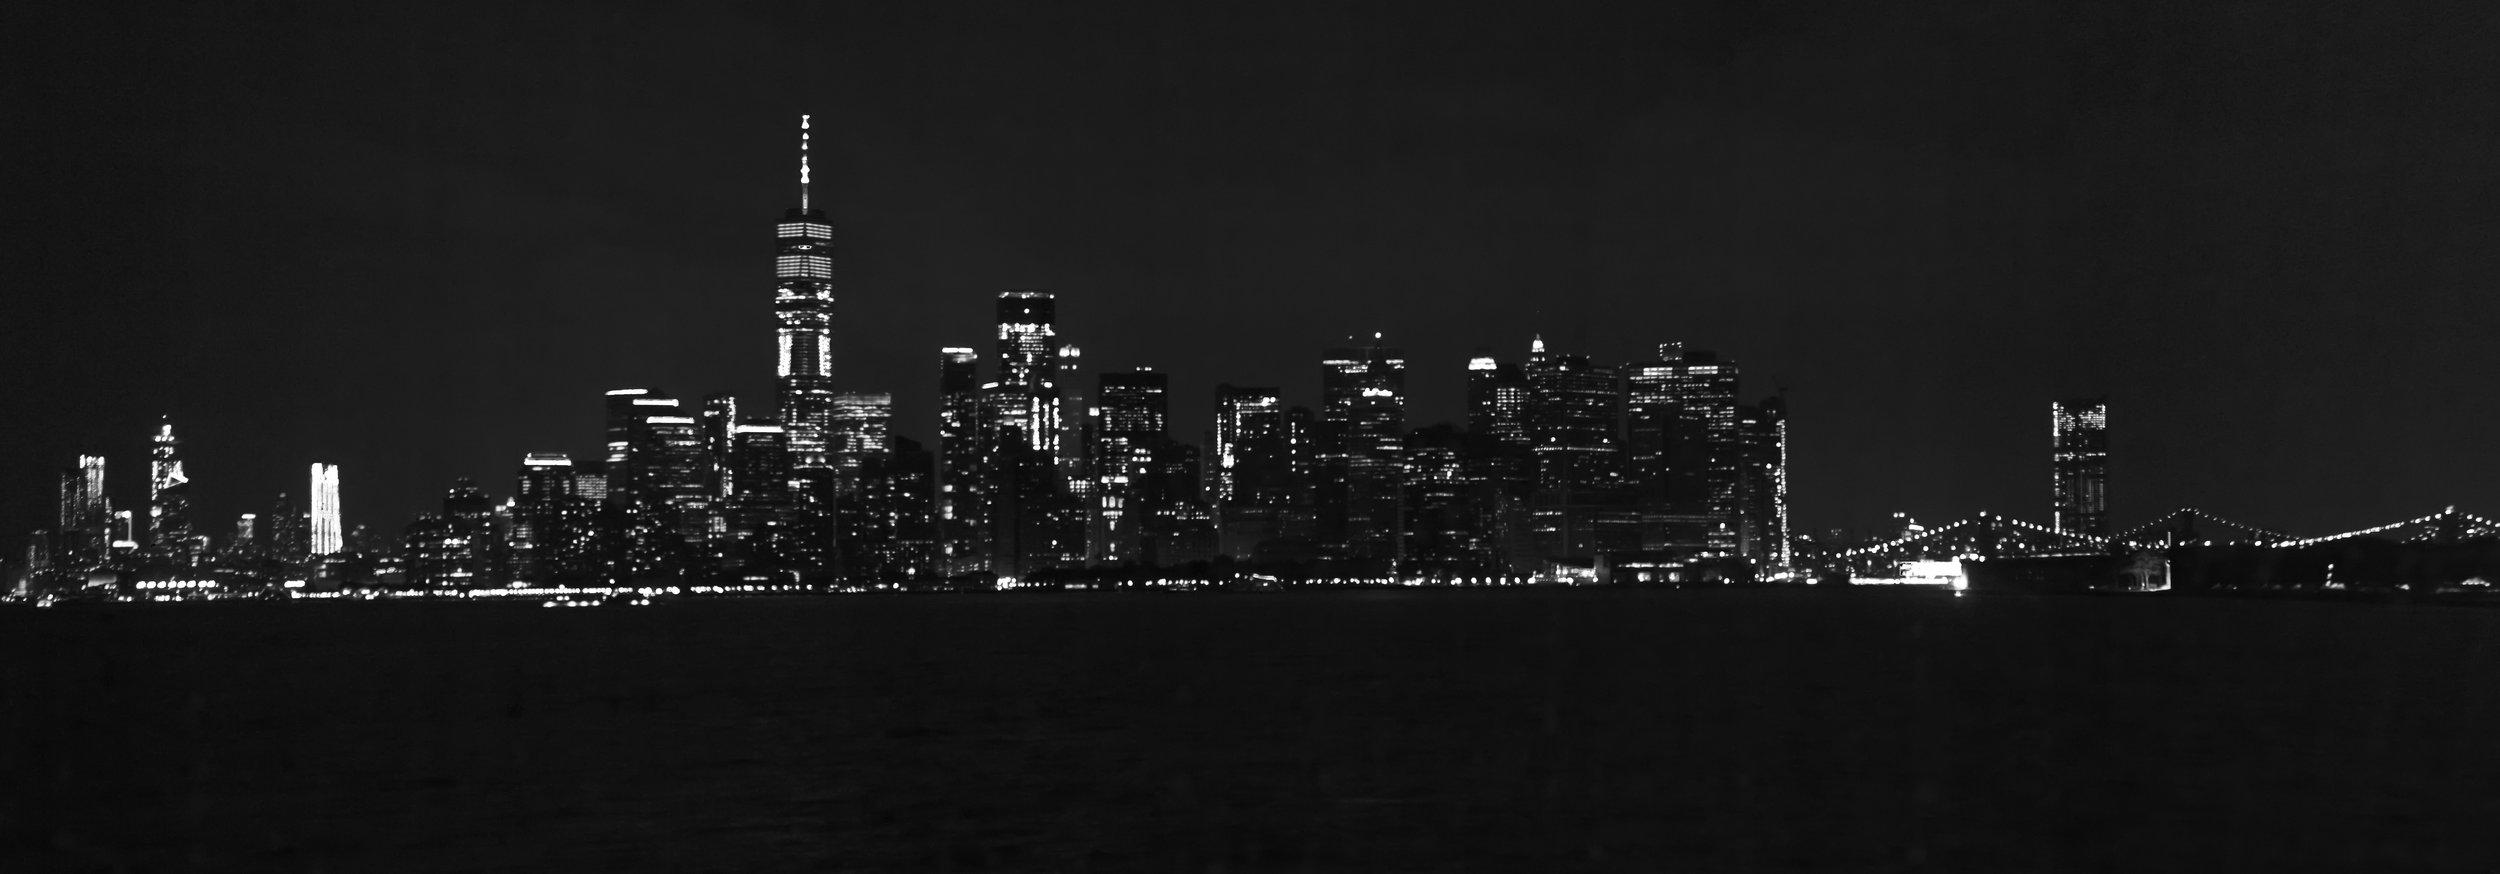 Skyline Pano.jpg